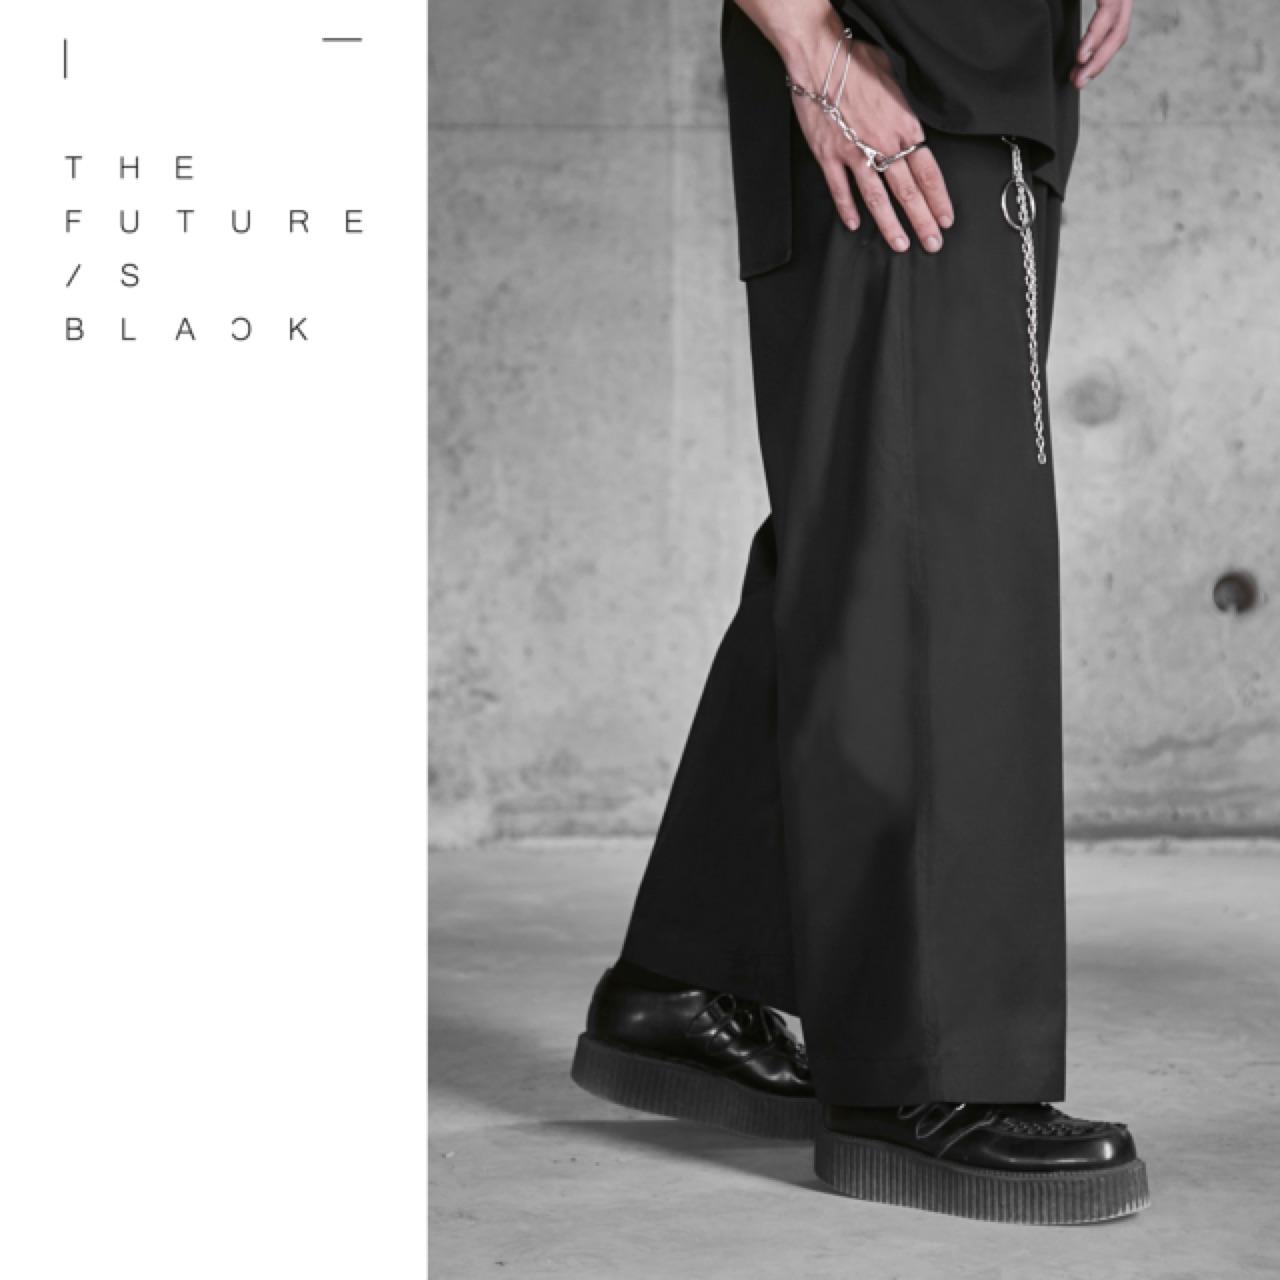 men,women,pants,unisex,ผู้ชาย,ผู้หญิง,กางเกงผู้ชาย,กางเกงผู้หญิง,กางเกงขายาว,กางเกงขายาวสีดำ,กางเกงขายาวสีขาว,กางเกงขากระบอก